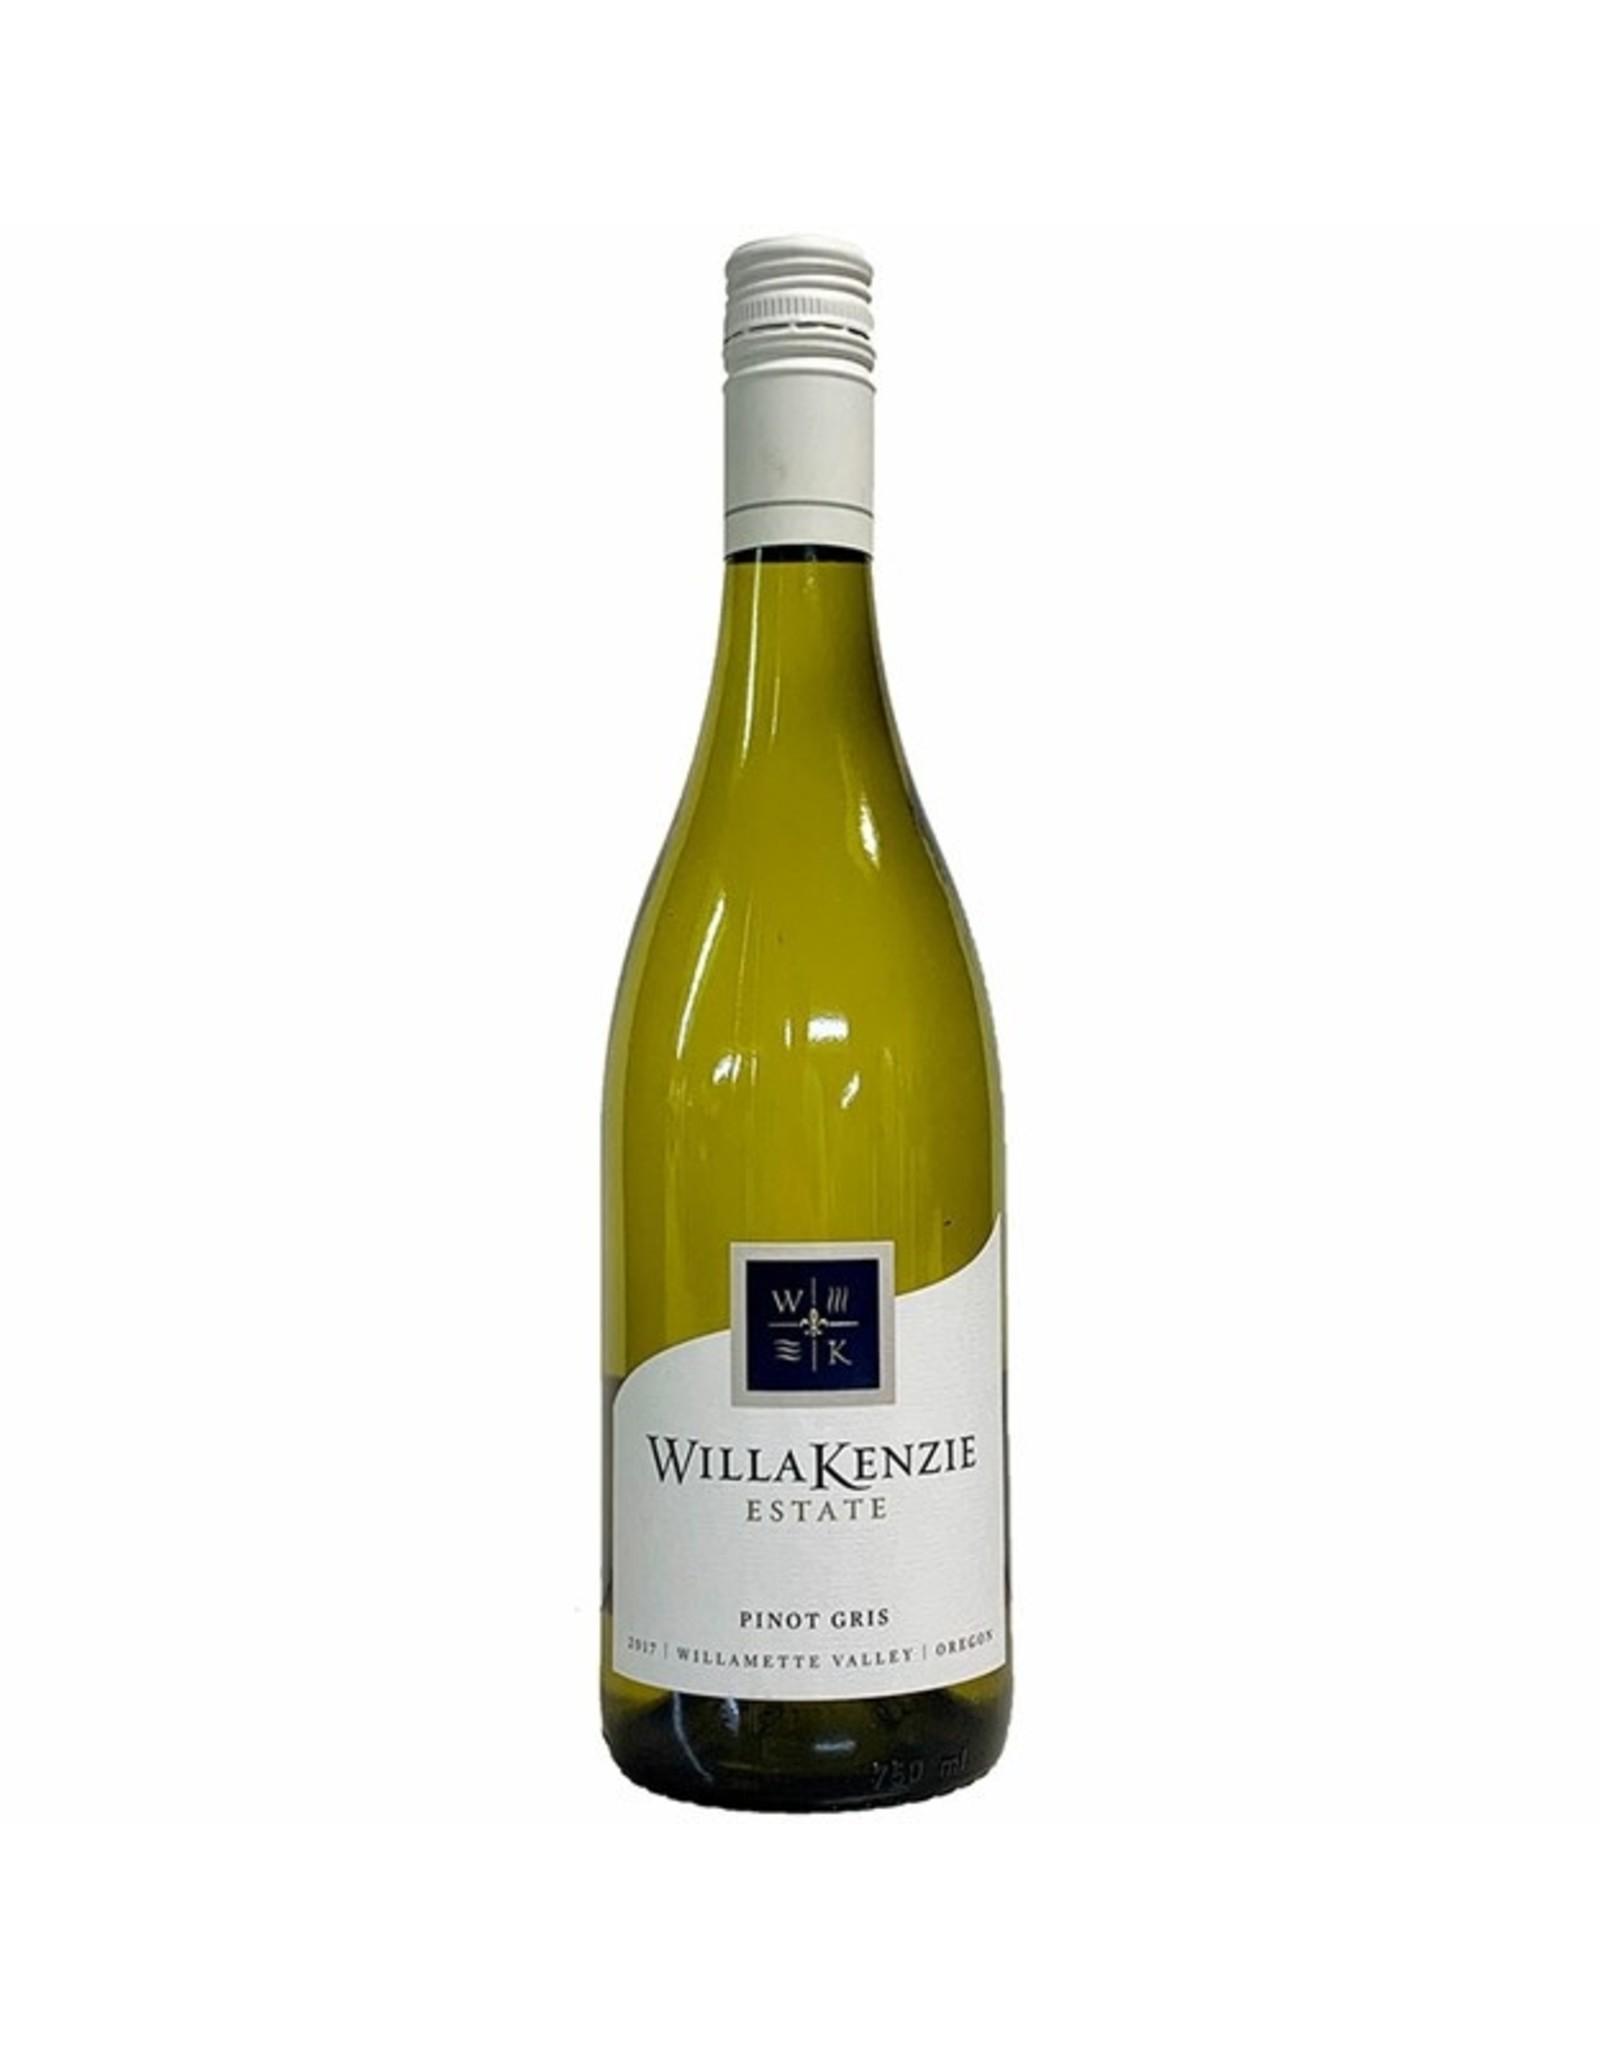 Willakenzie Estate Pinot Gris